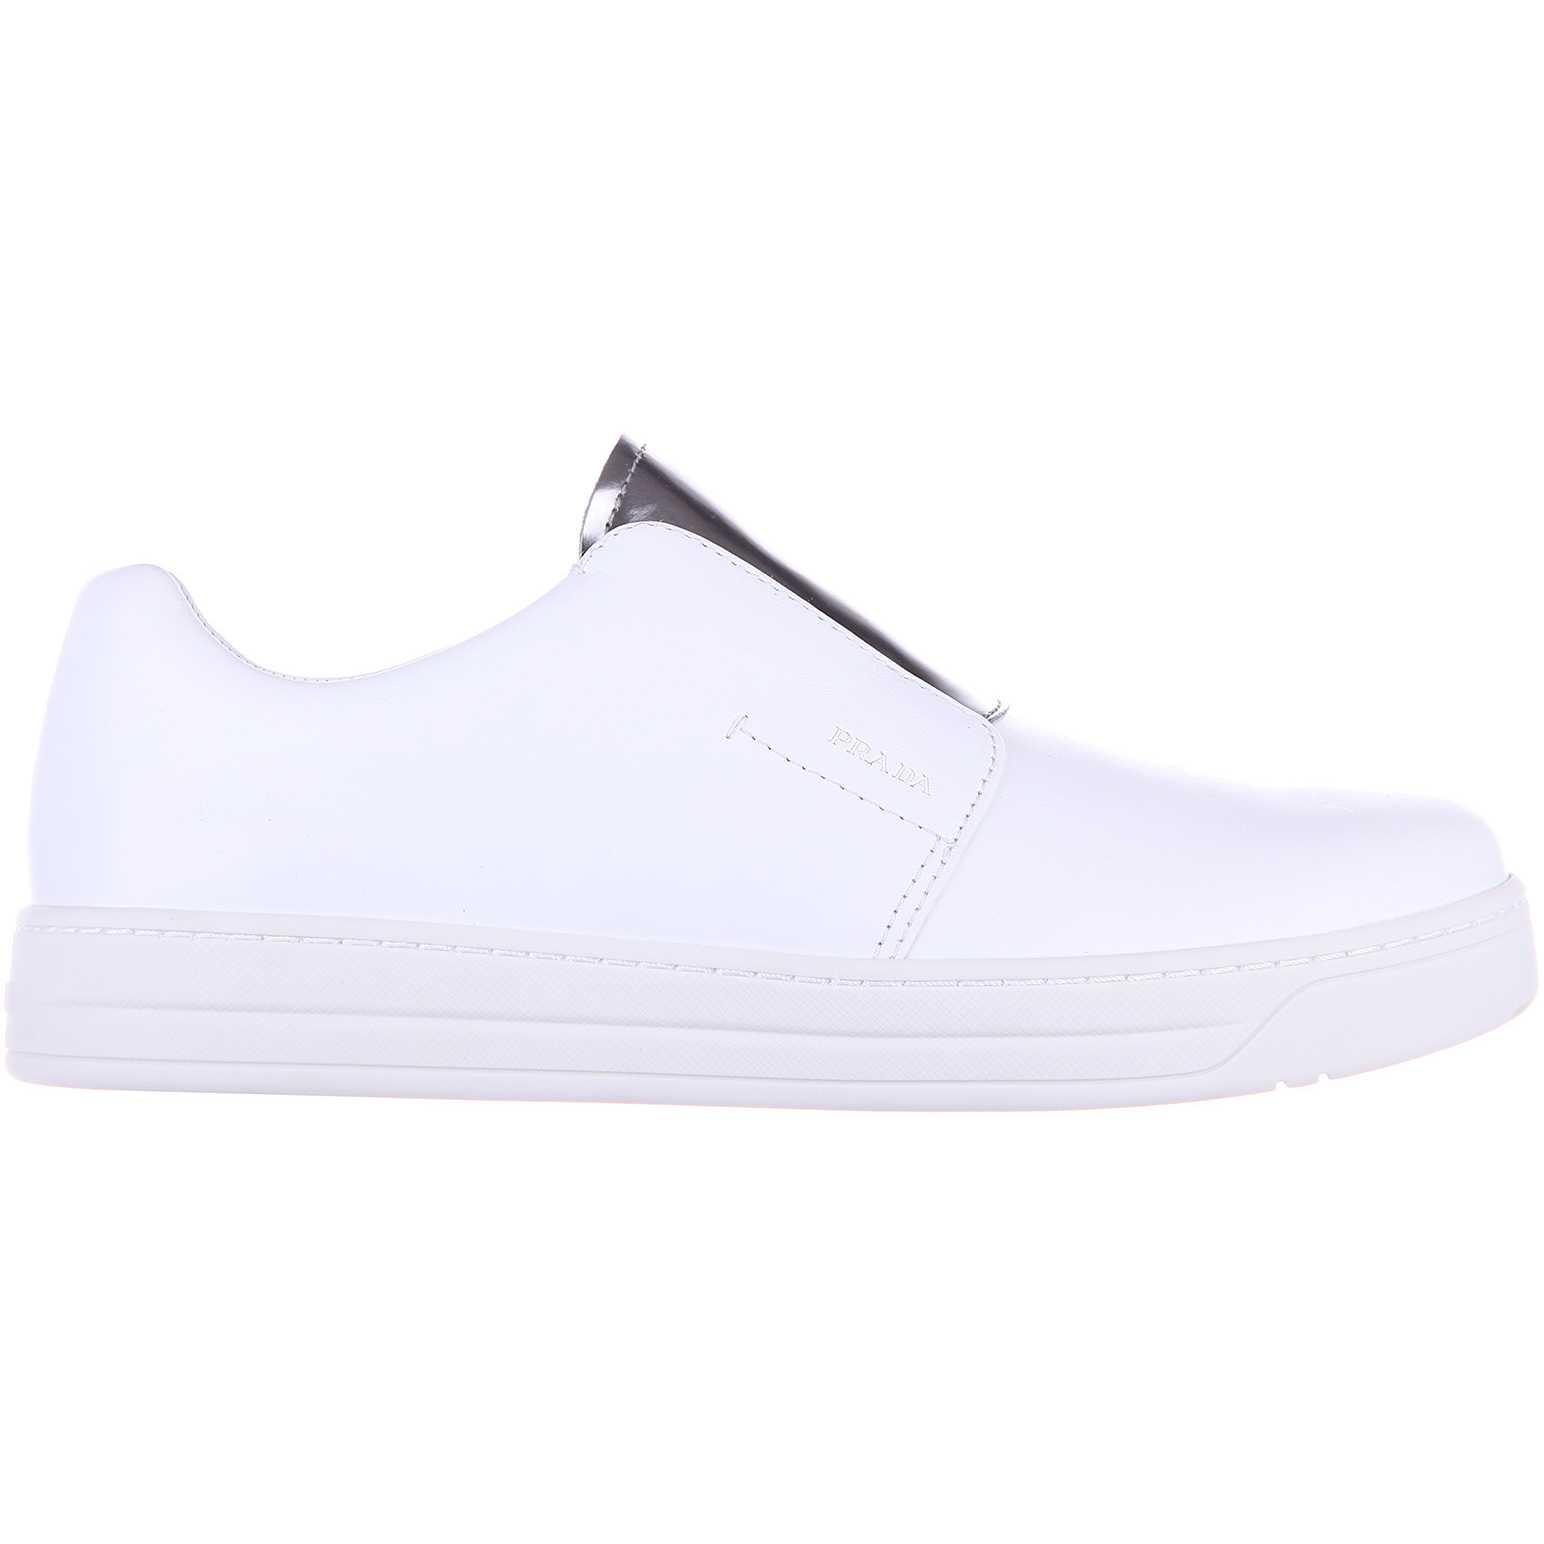 Prada Sneakers Soft Calf Spazzolata White pentru dama